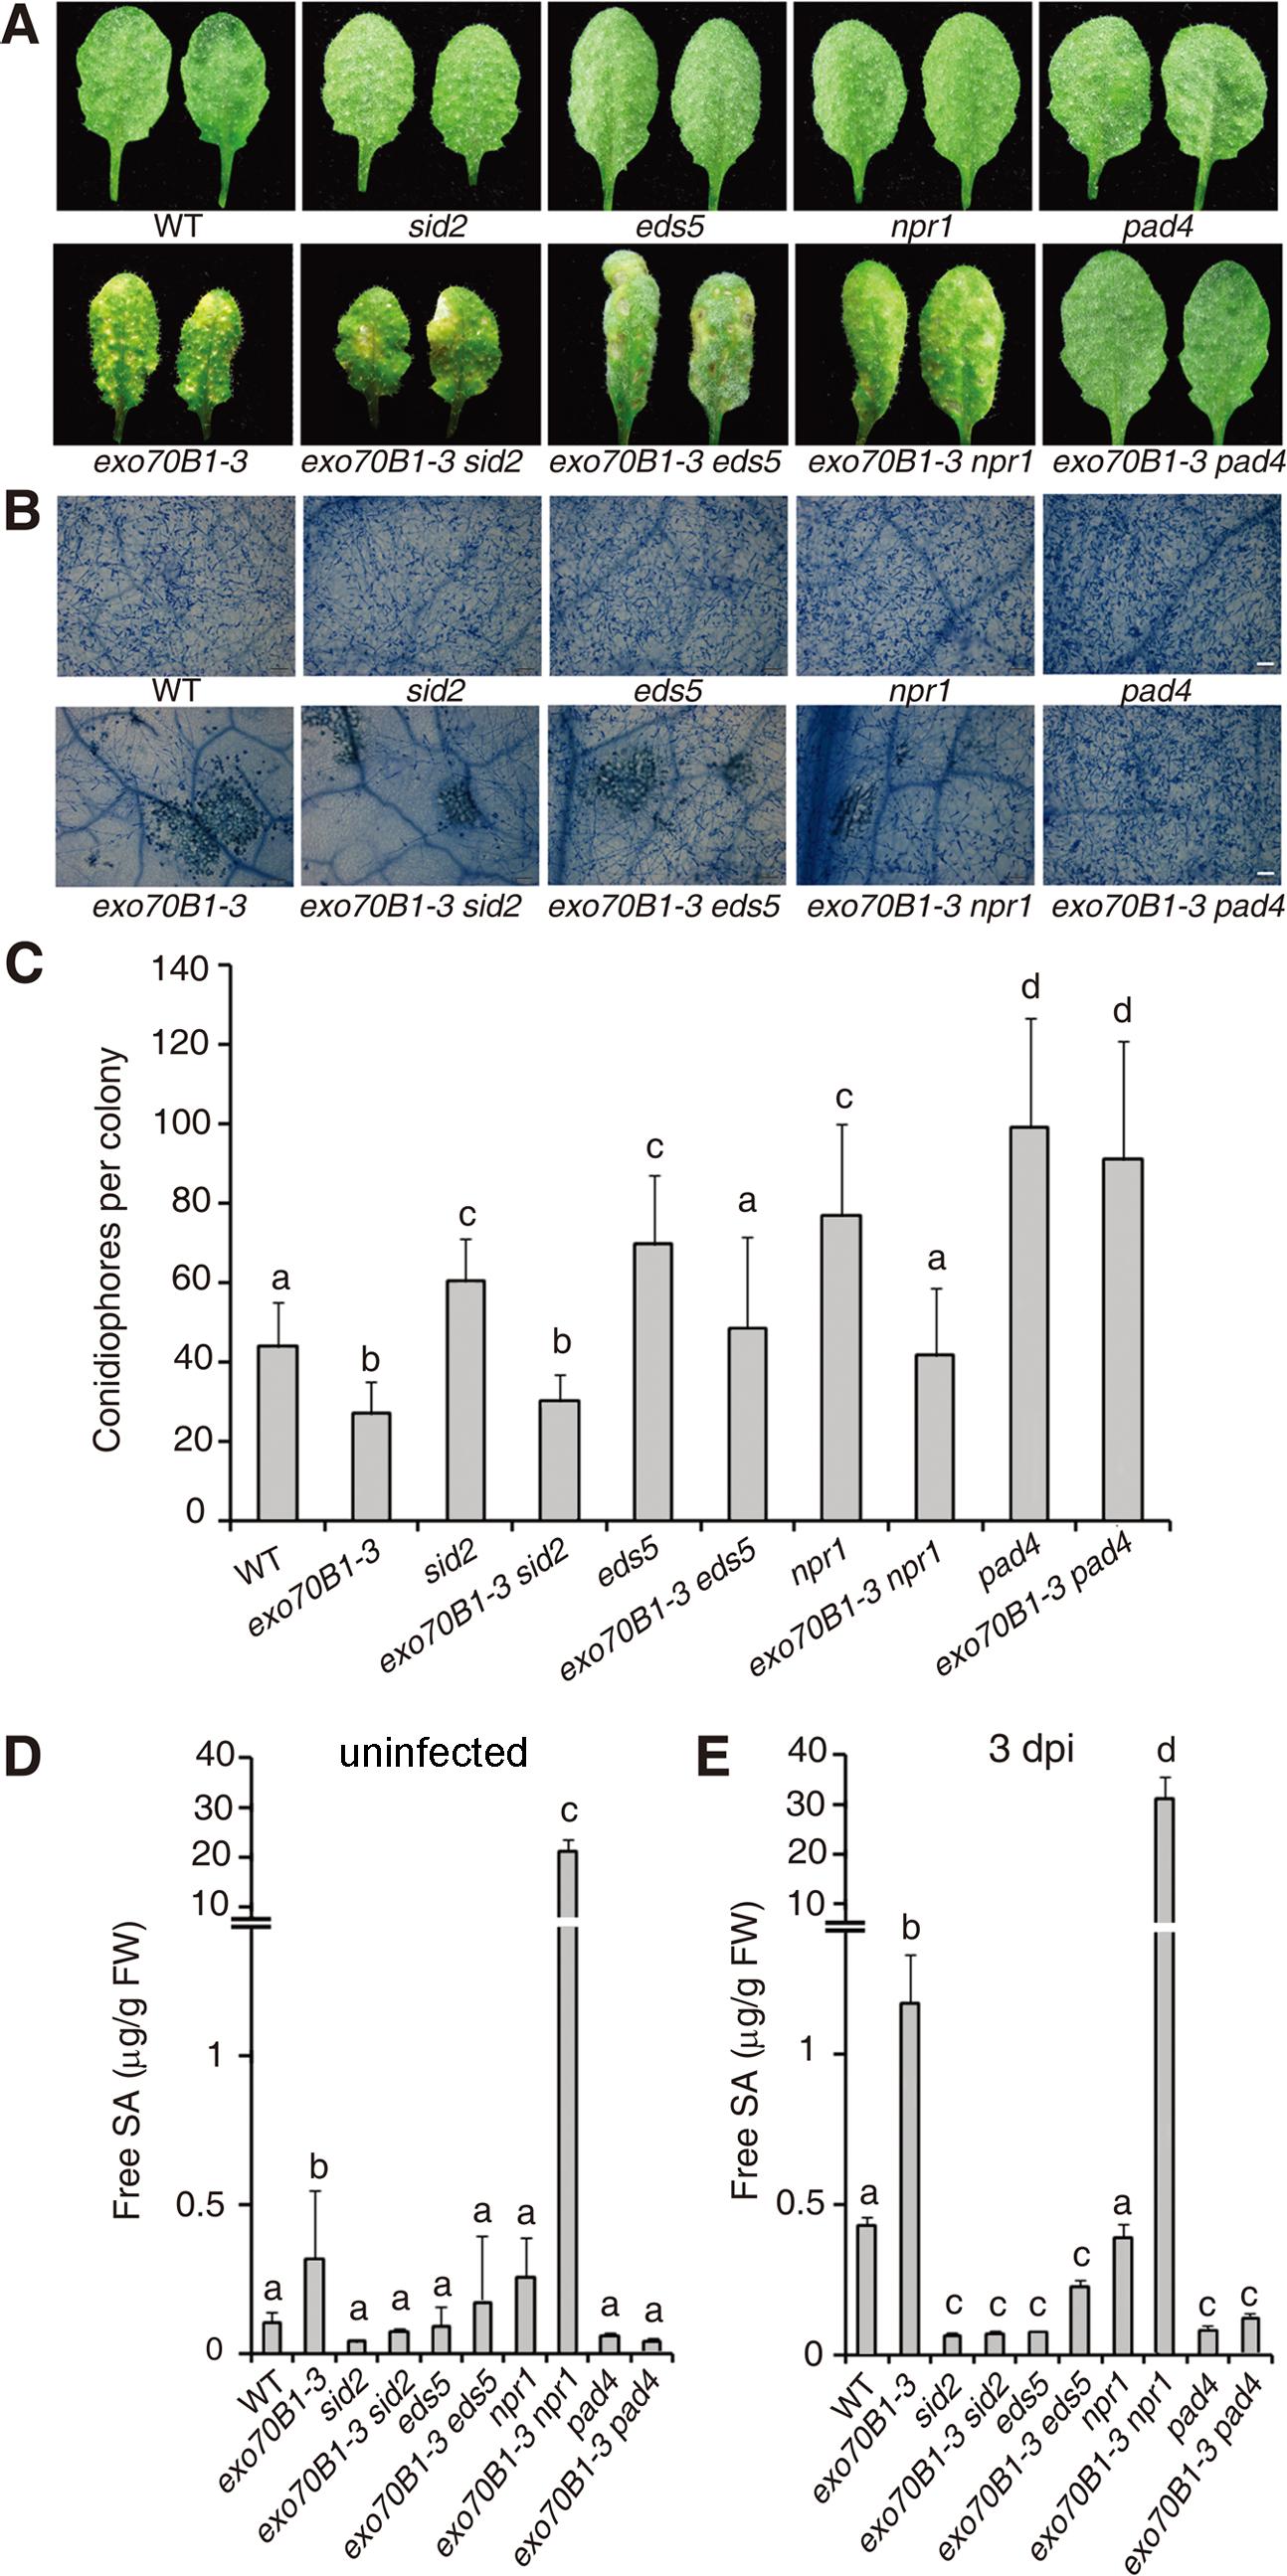 The <i>exo70B1-3</i> mutants accumulate high levels of SA and their enhanced resistance to <i>G. cichoracearum</i> requires <i>EDS5, NPR1</i> and <i>PAD4</i>.